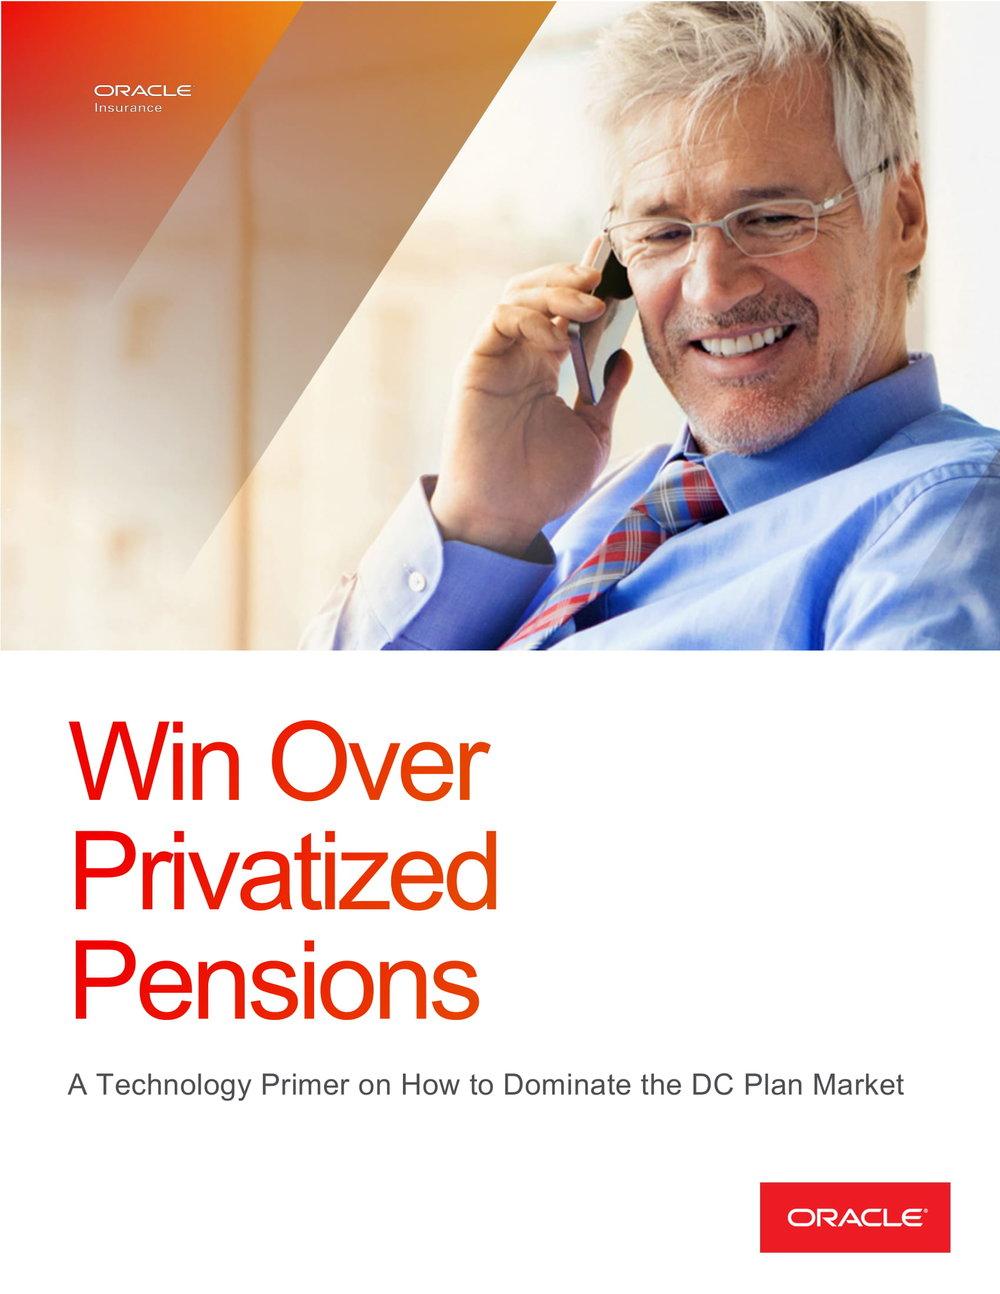 Win Over Privatized Pensions